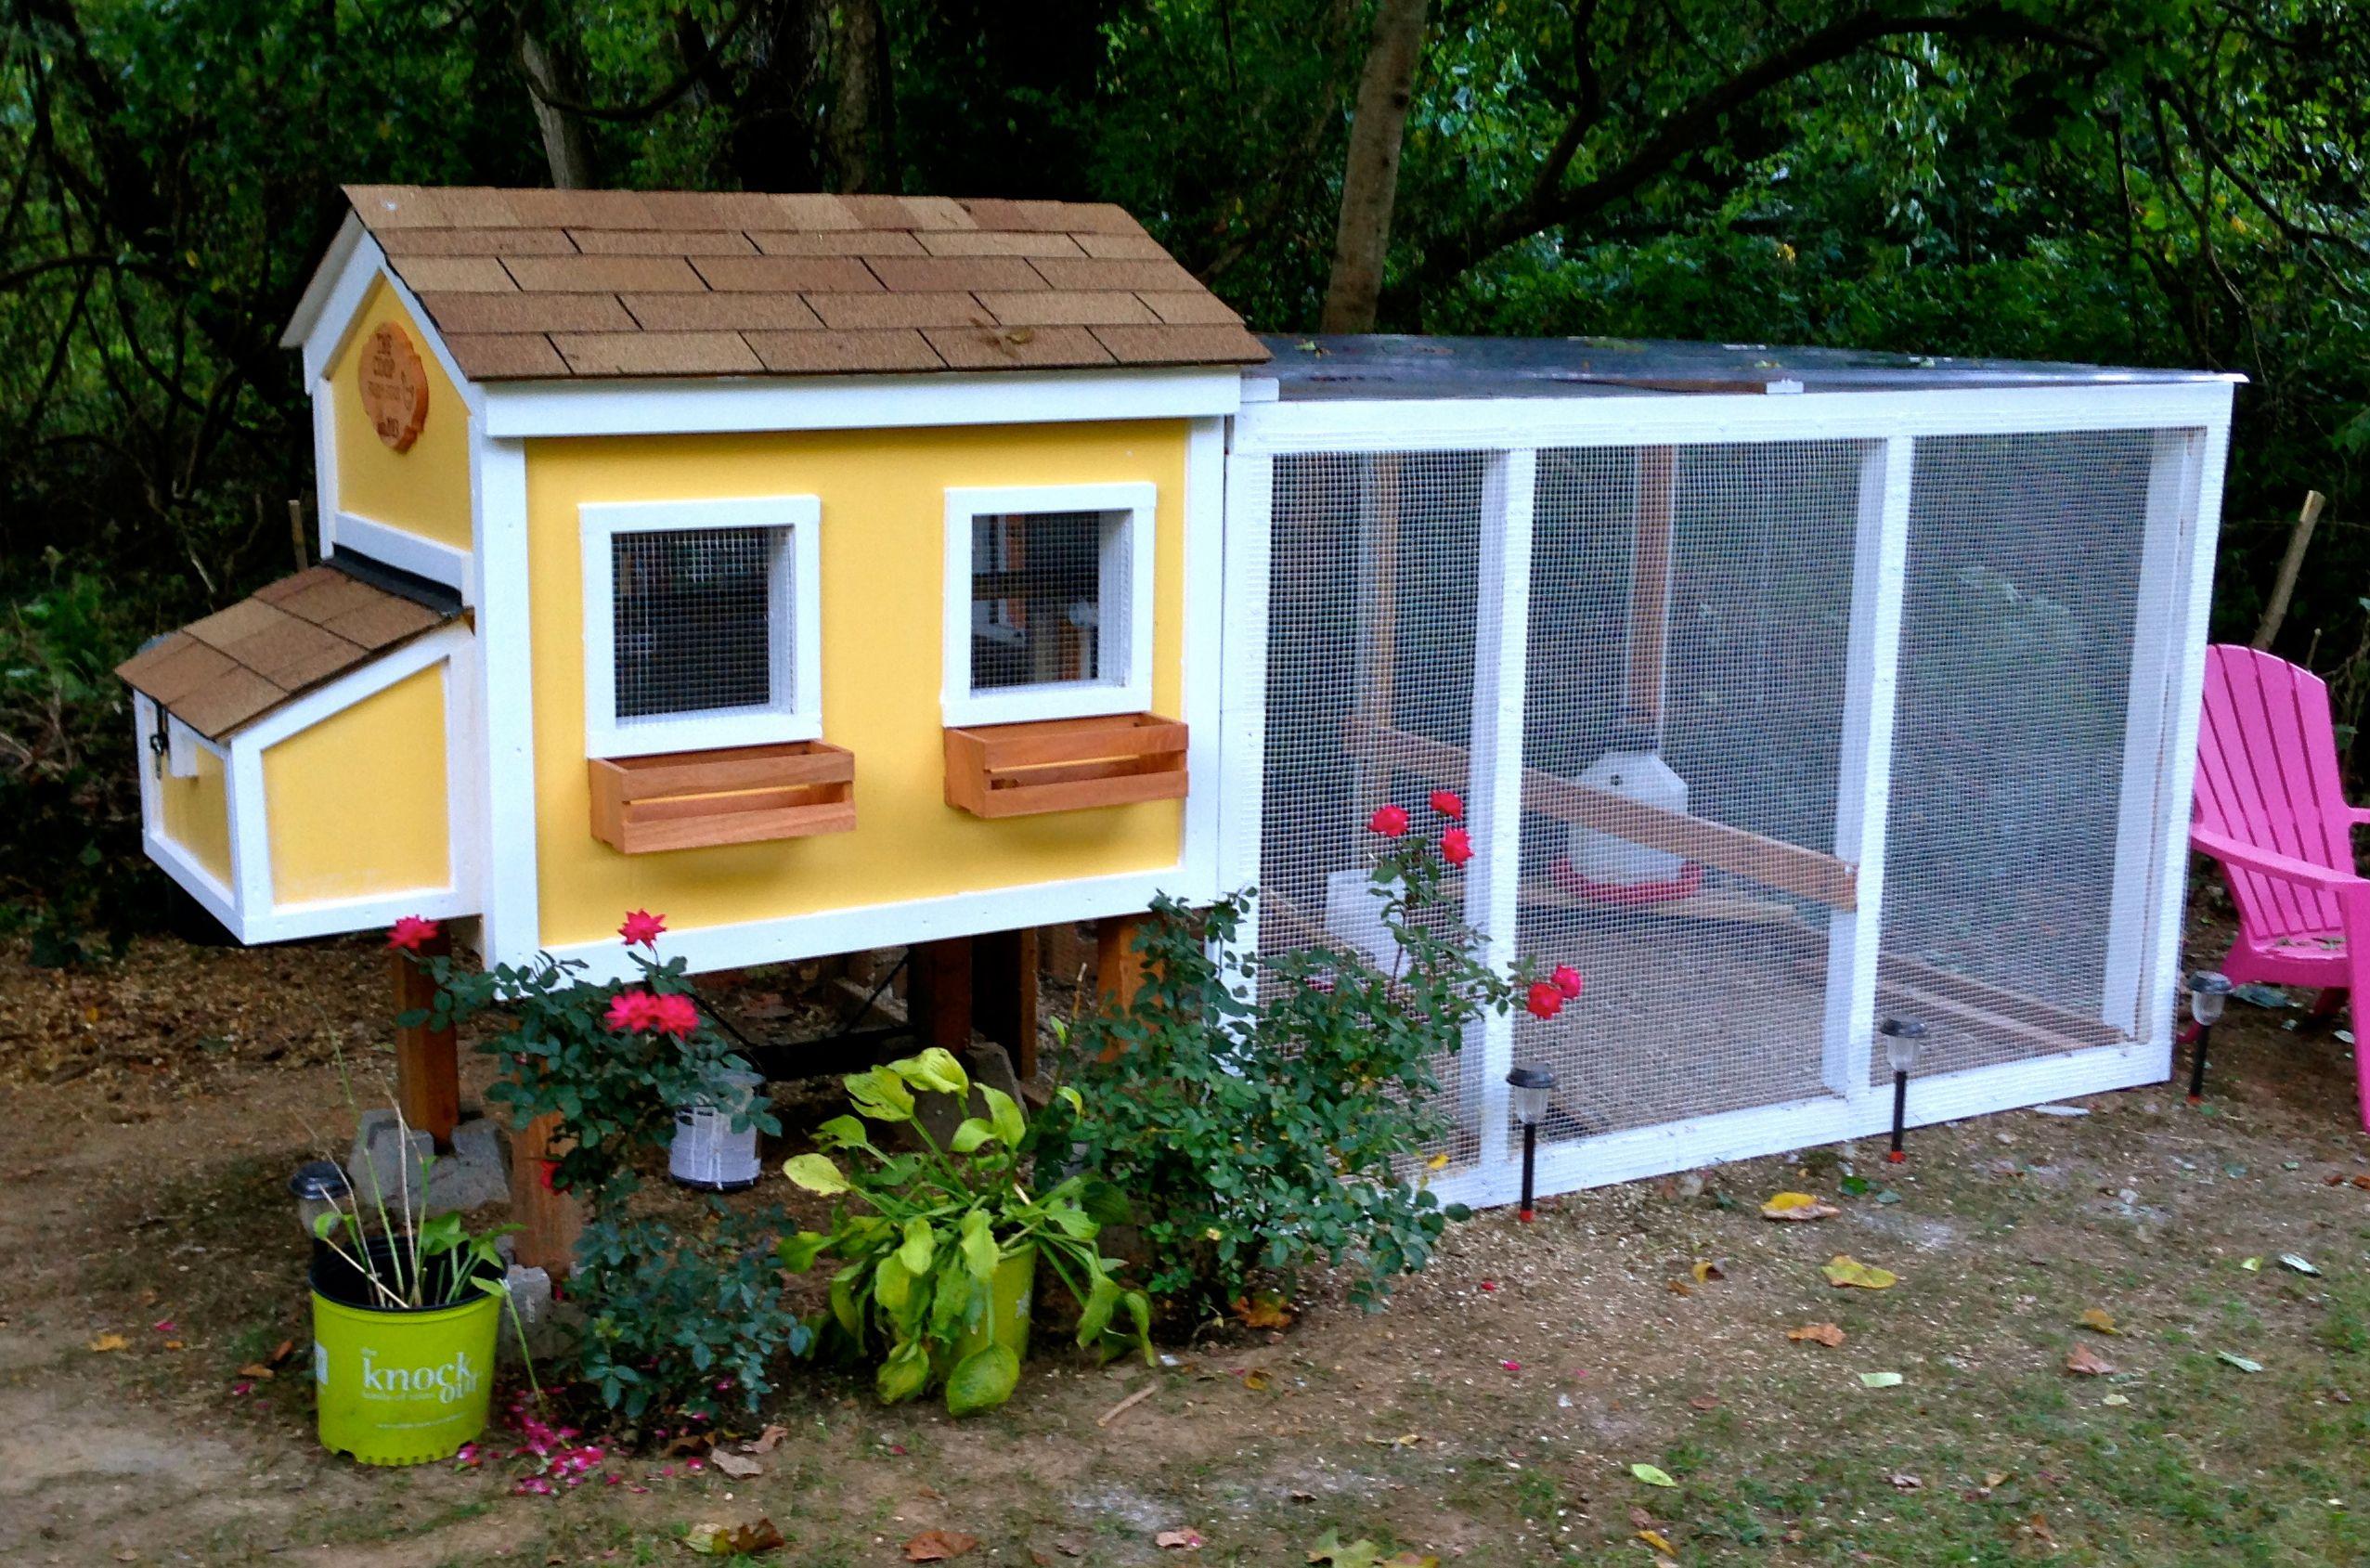 Easy Backyard Chicken Coop Plans Small Chicken Coops Chickens Backyard Backyard Chicken Coops Backyard chicken coop designs